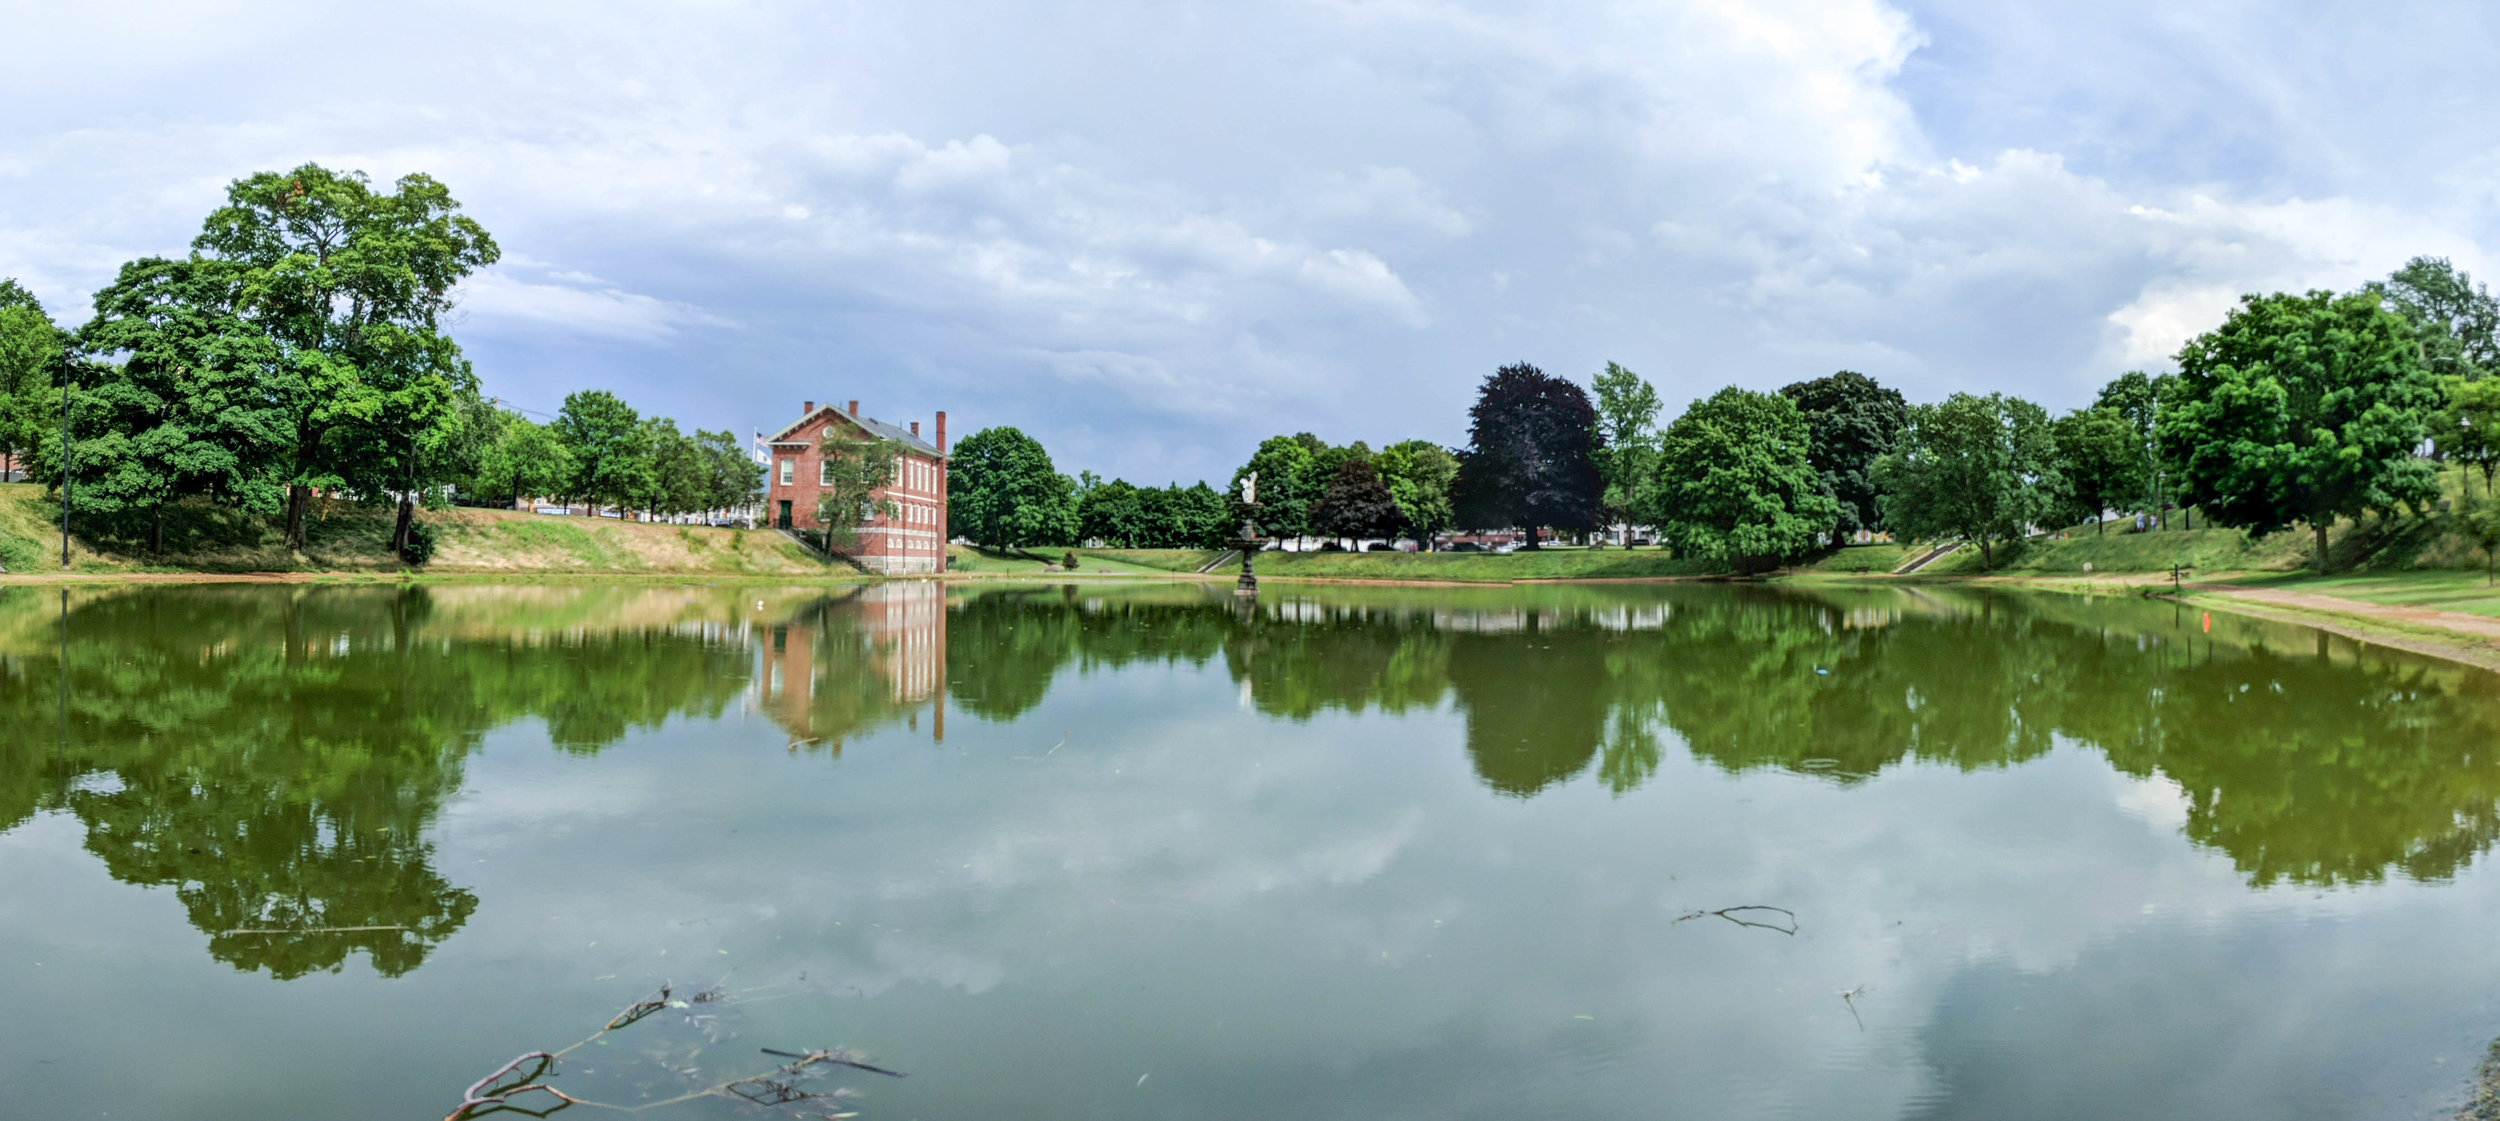 bri rinehart; photography; newburyport; frog pond